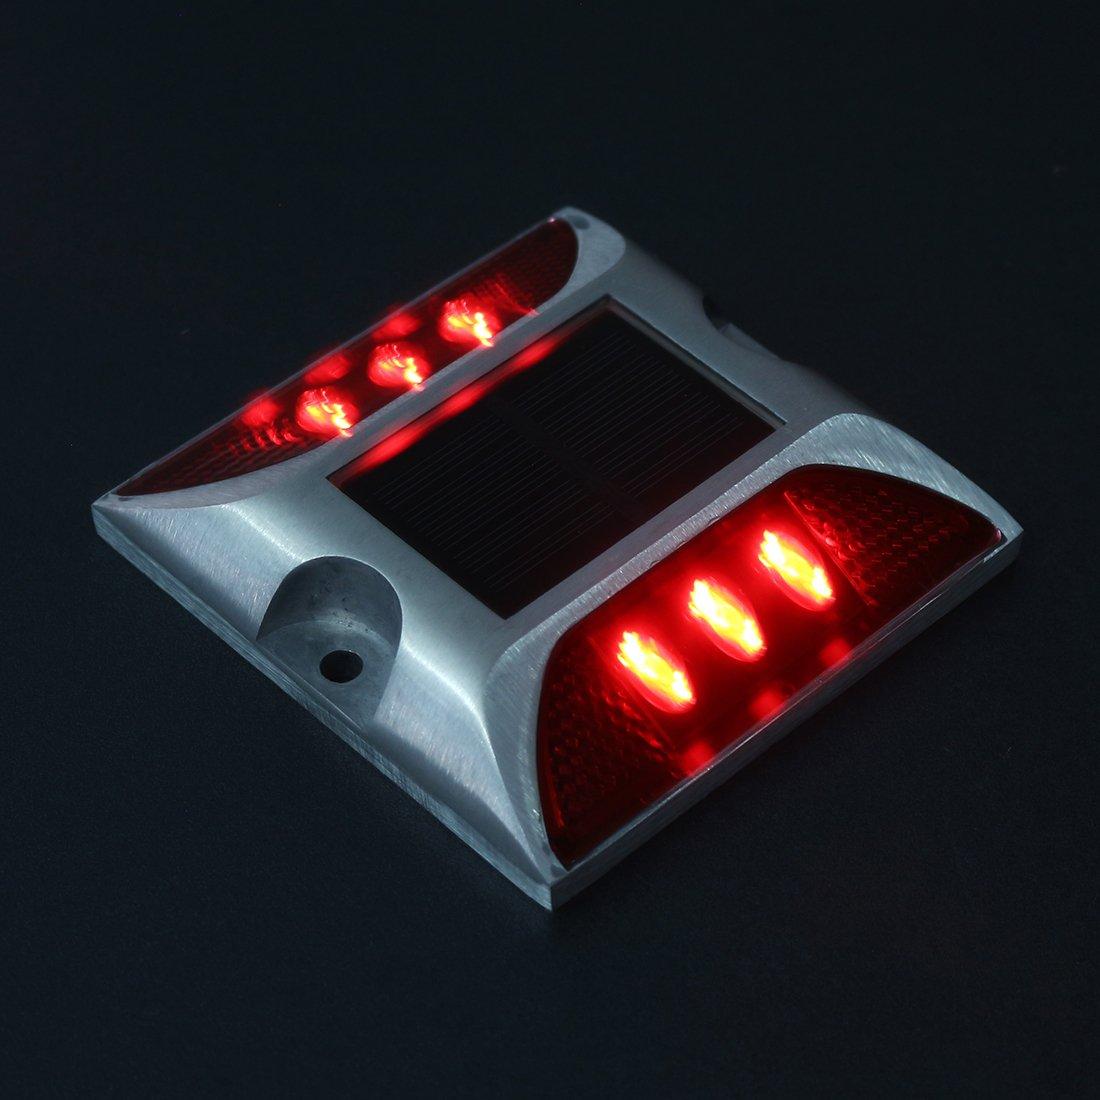 uxcell 2pcs LED Solar Road Stud Light Marker Lighting Security Warning Lamp 6LED Blue